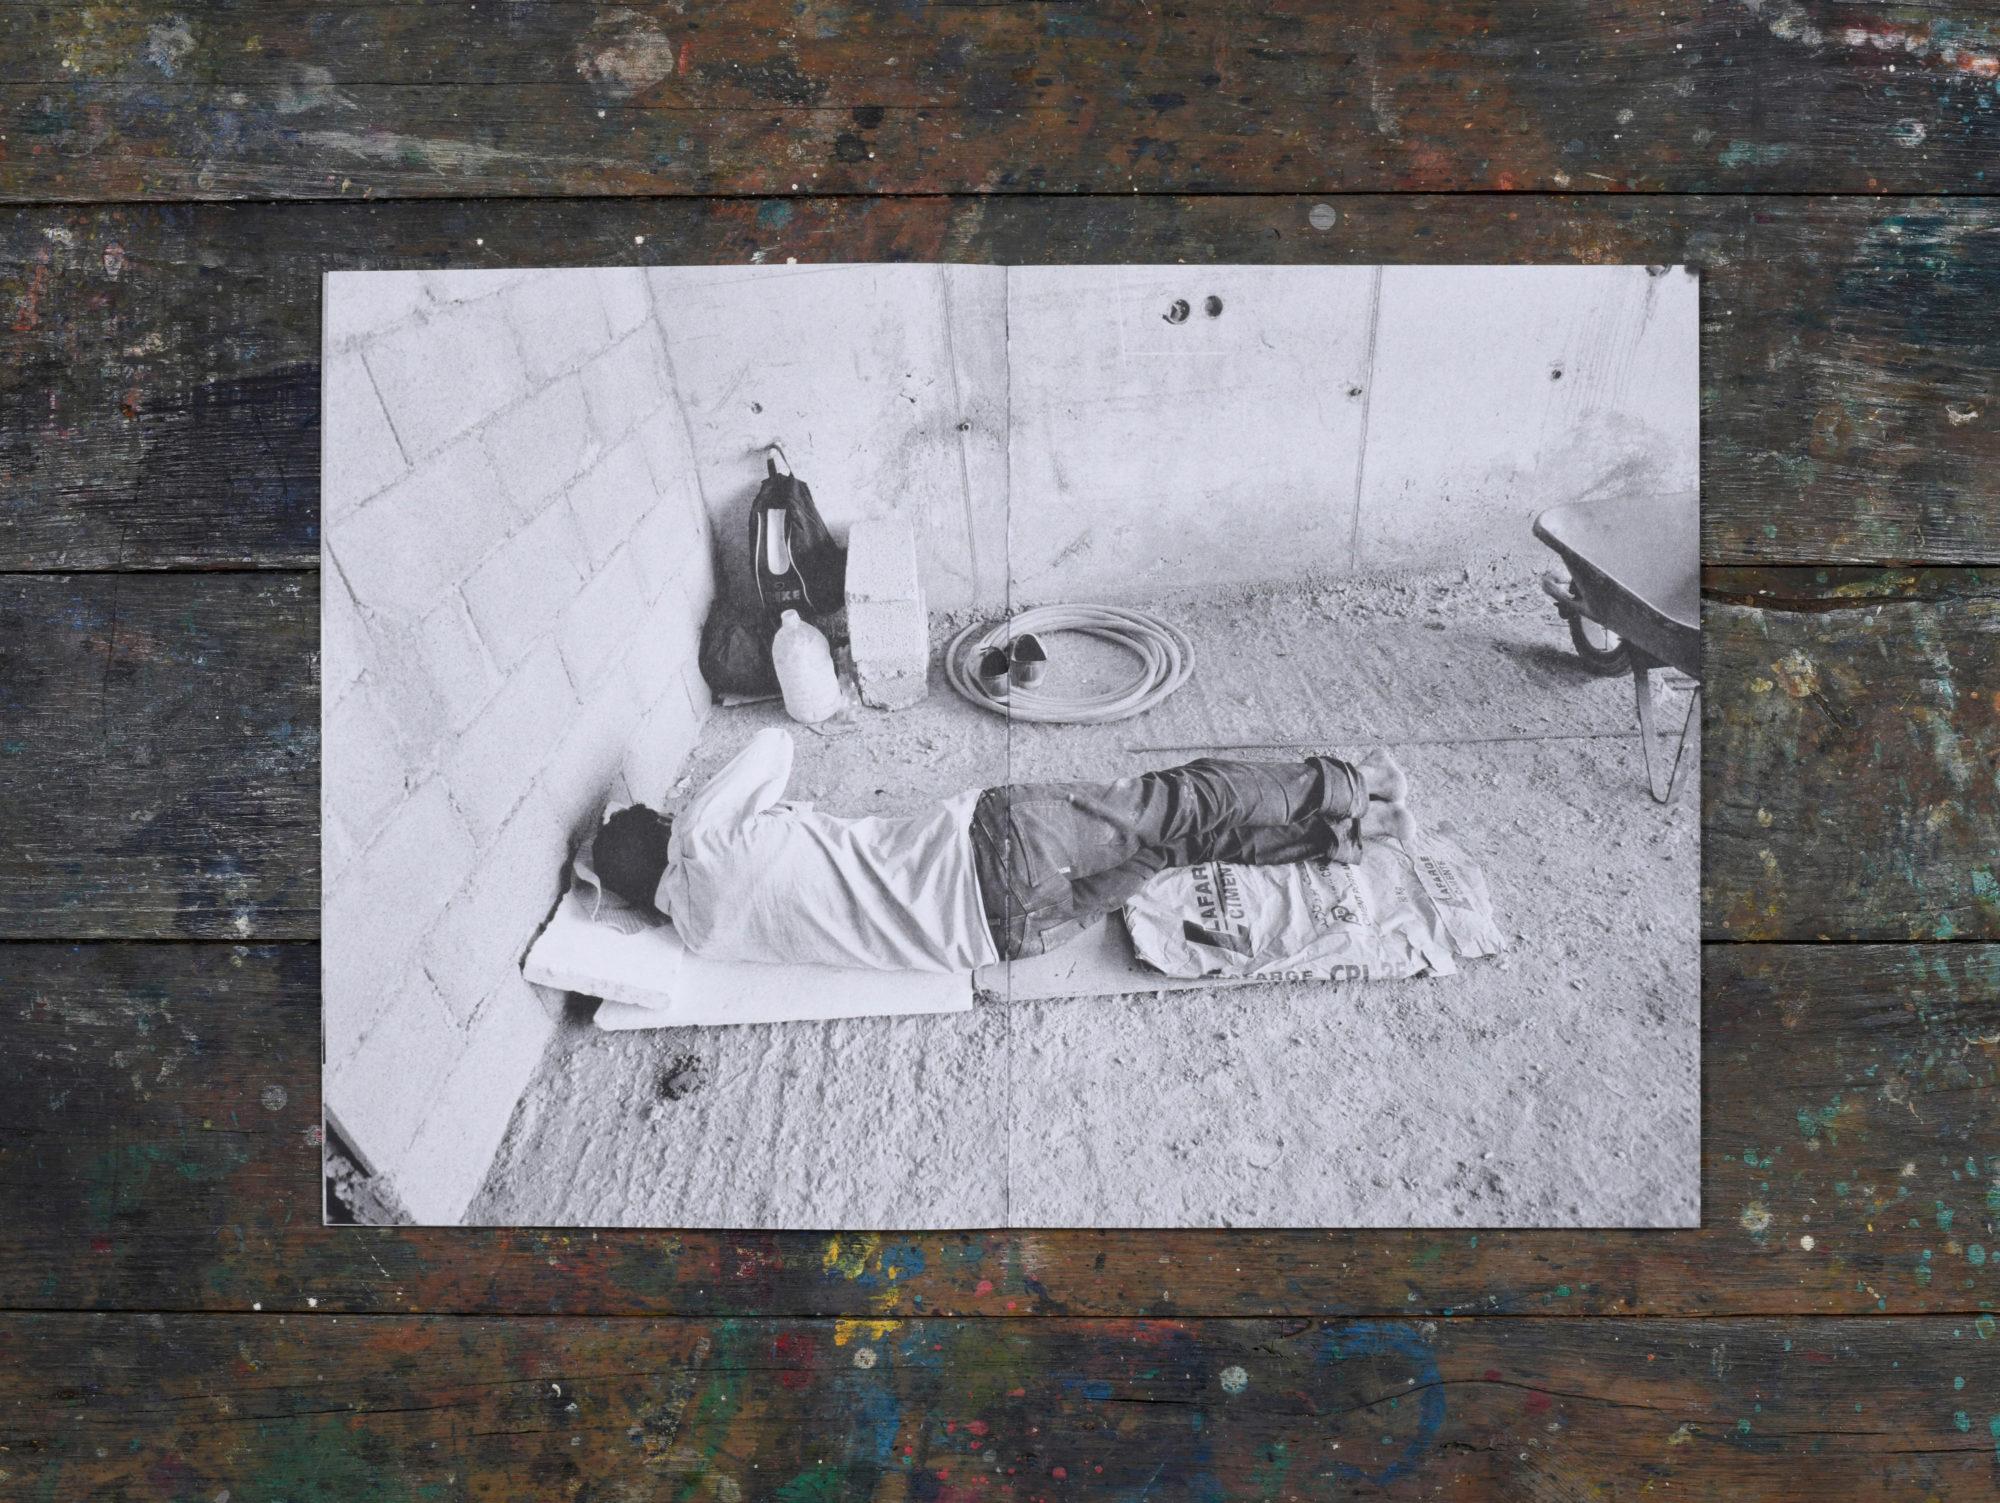 Dreamers - François-Marie Banier